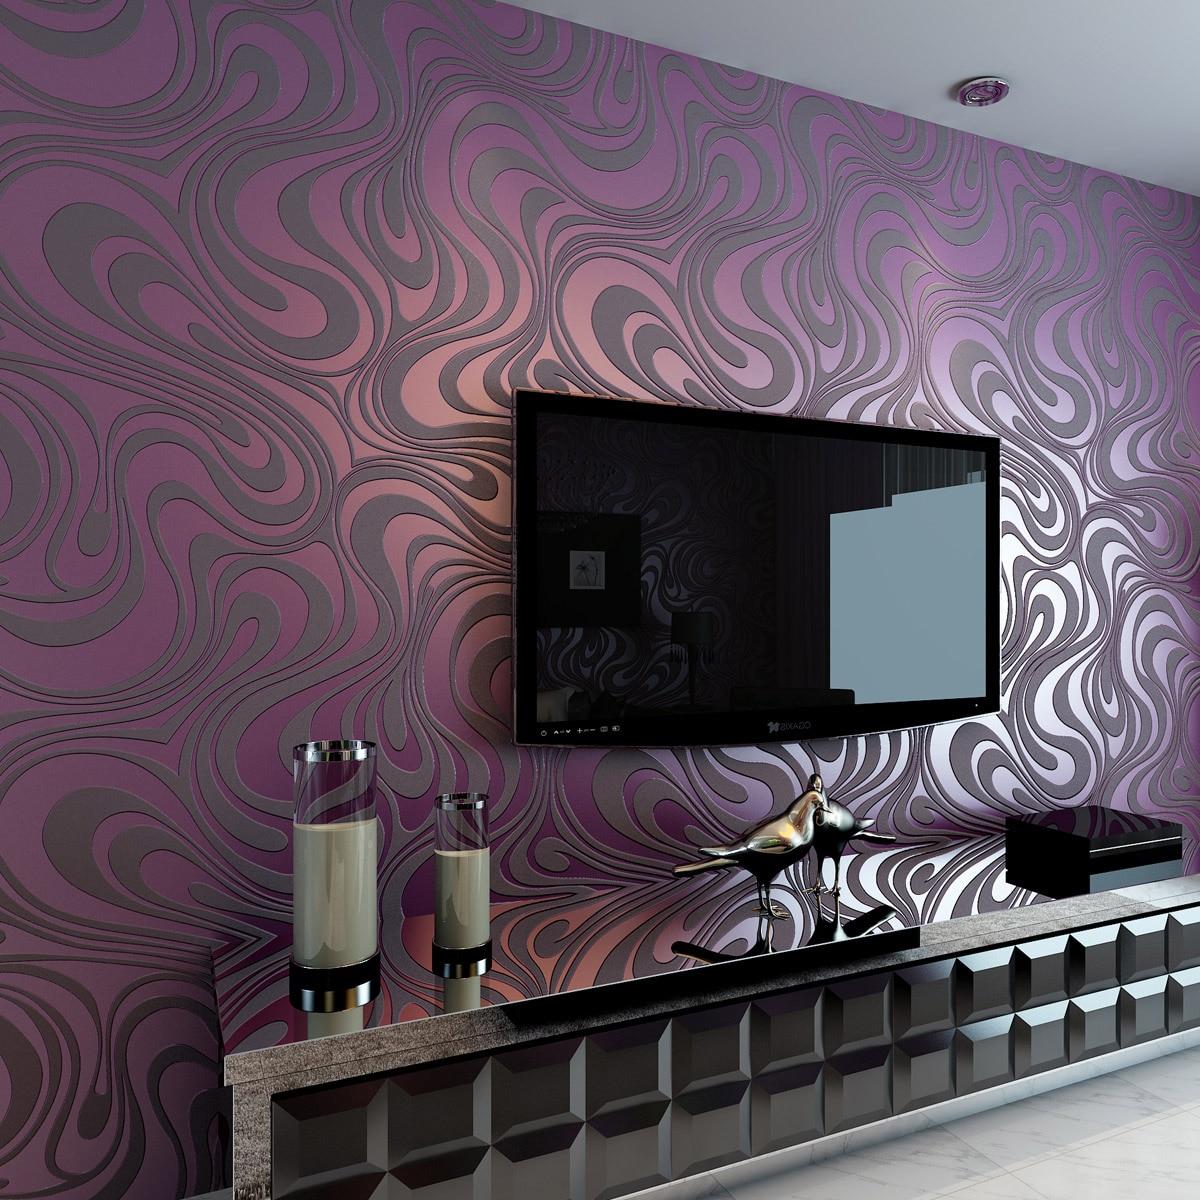 Modern Living Room With Golden Stripes Background Wallpaper  Glitter Paper Wallpapers Roll Vinyl  Papel De Parede 3d Moderno<br><br>Aliexpress